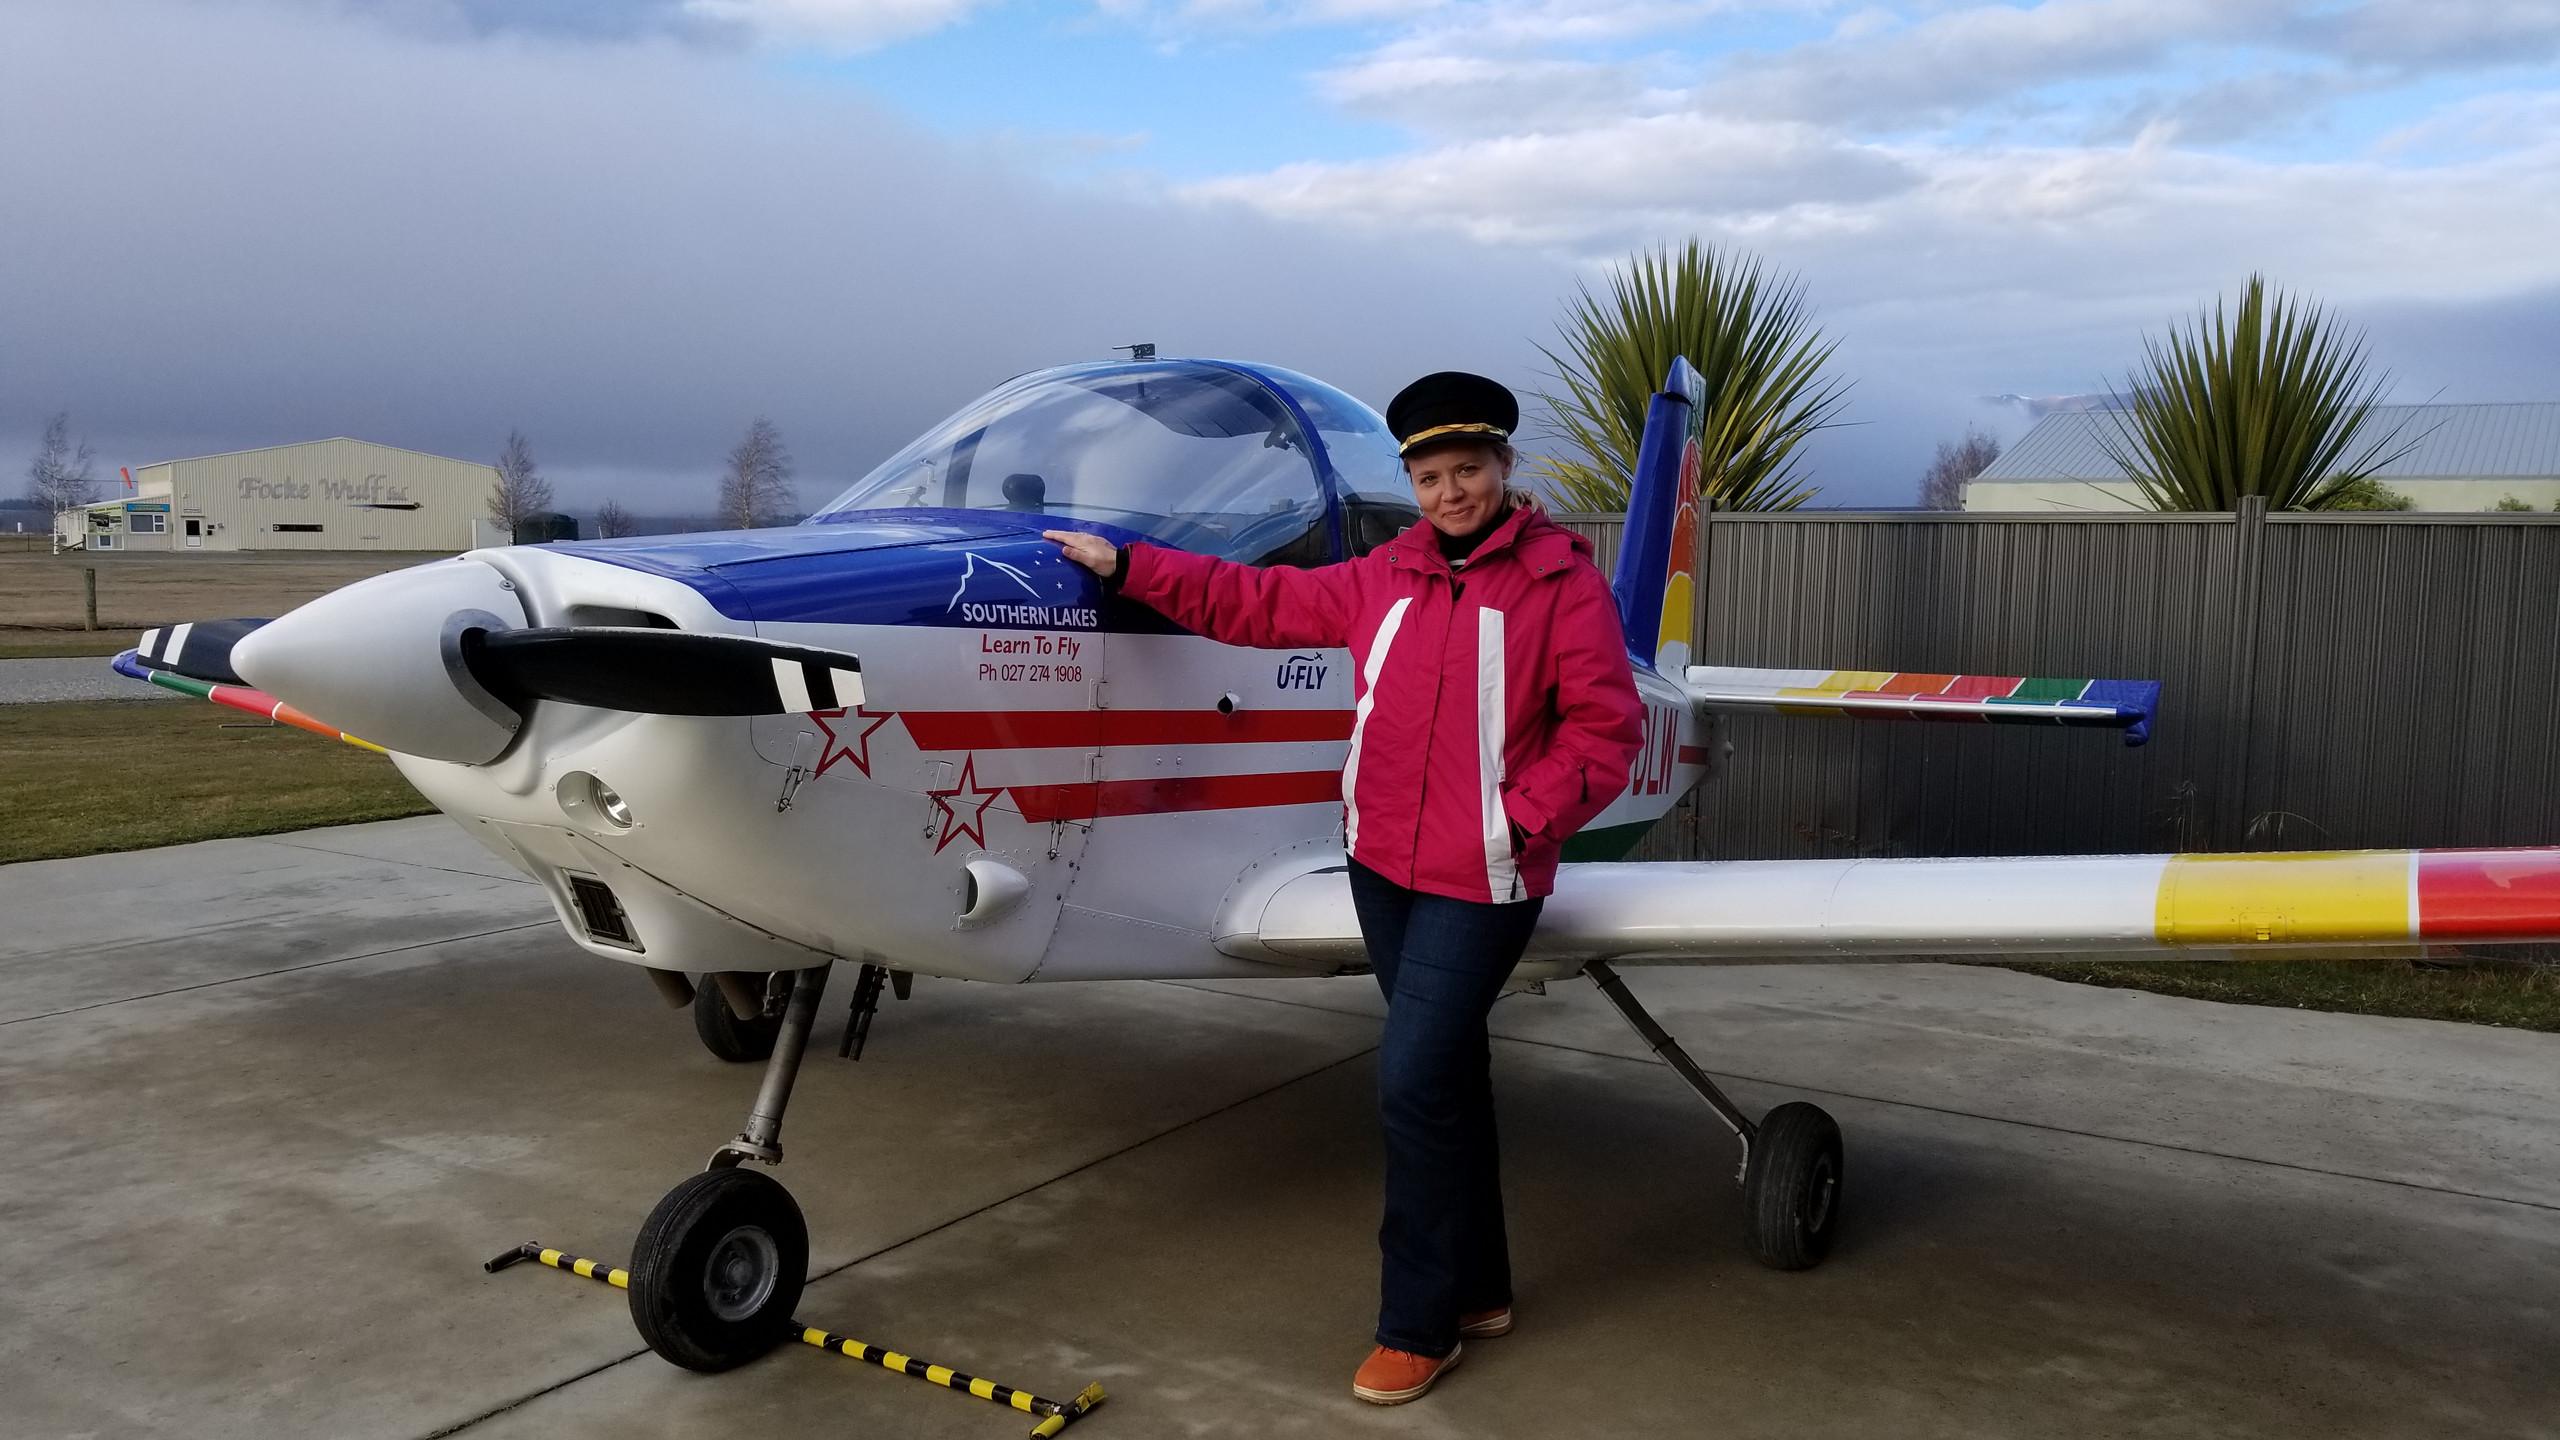 Pilot a plane in Wanaka New Zealand